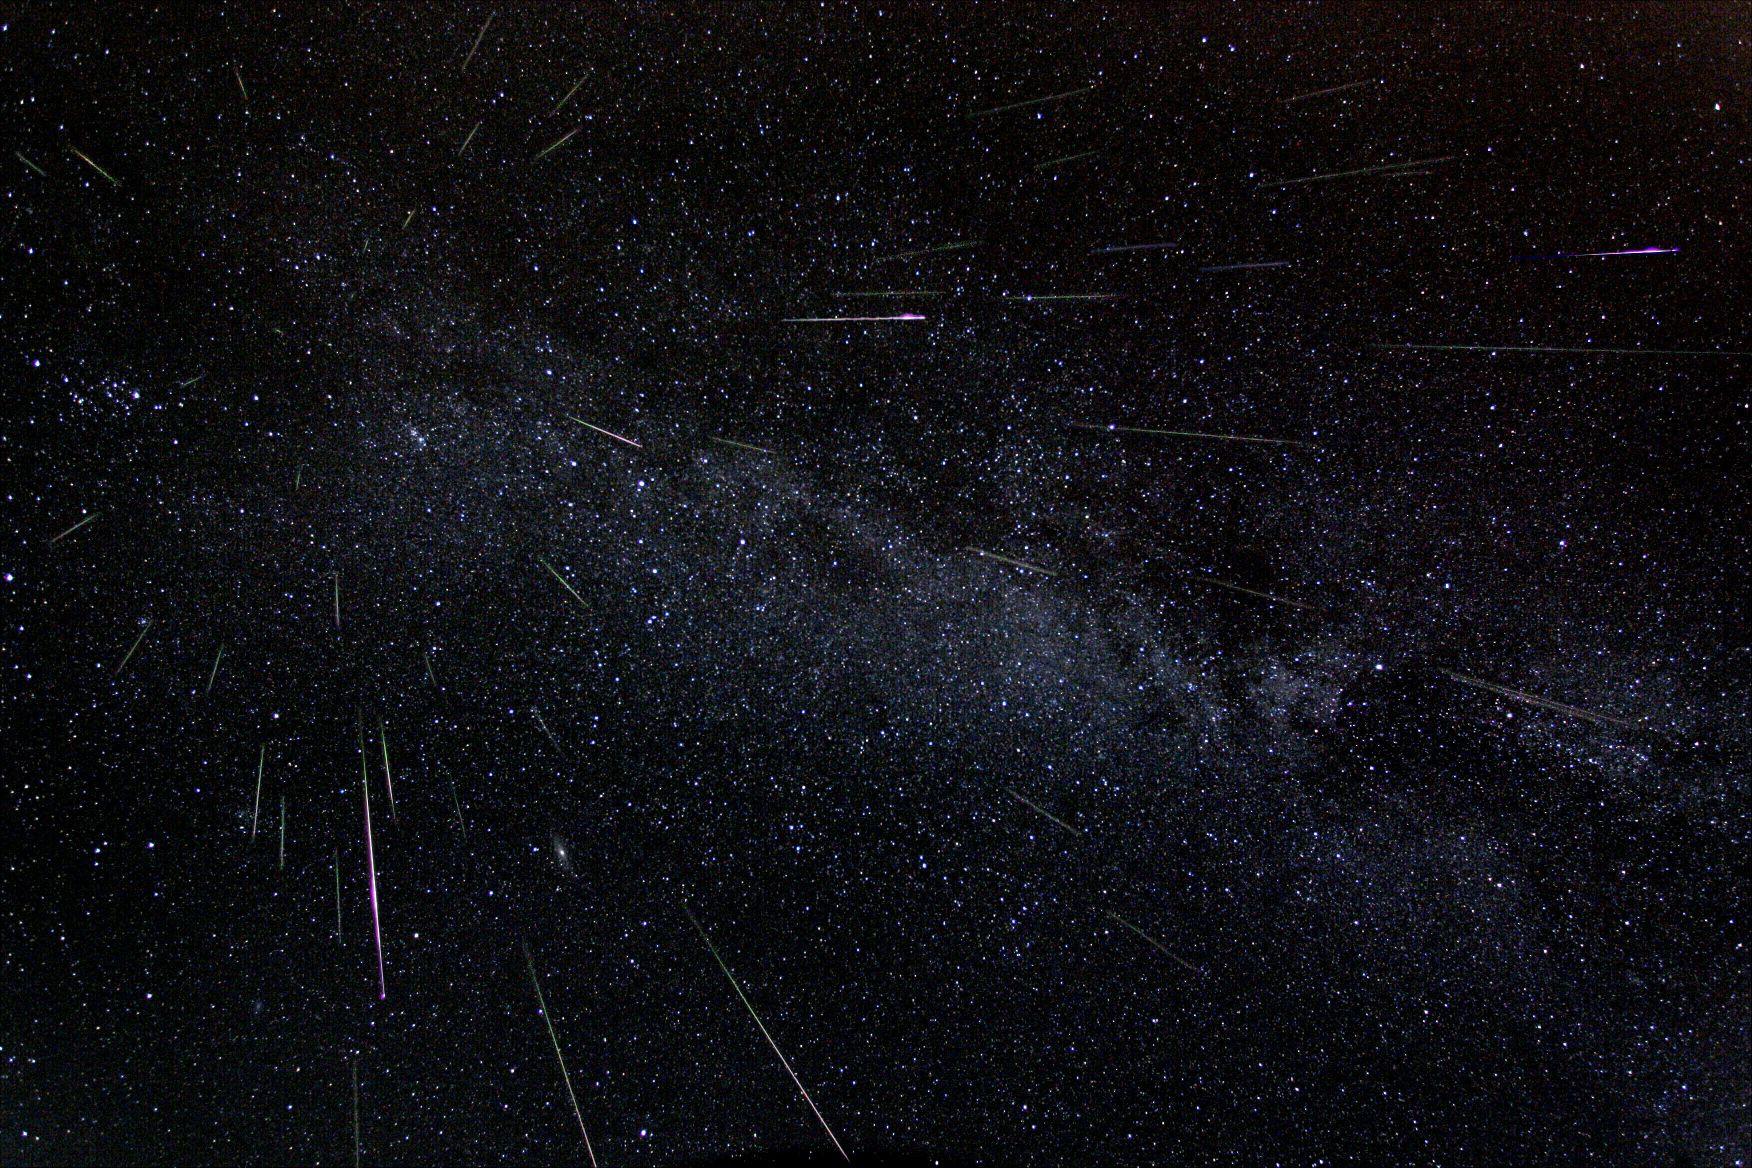 Chuva de meteoros Perseidas de agosto deste ano (Foto: nasamarshall | flickr | creative commons)